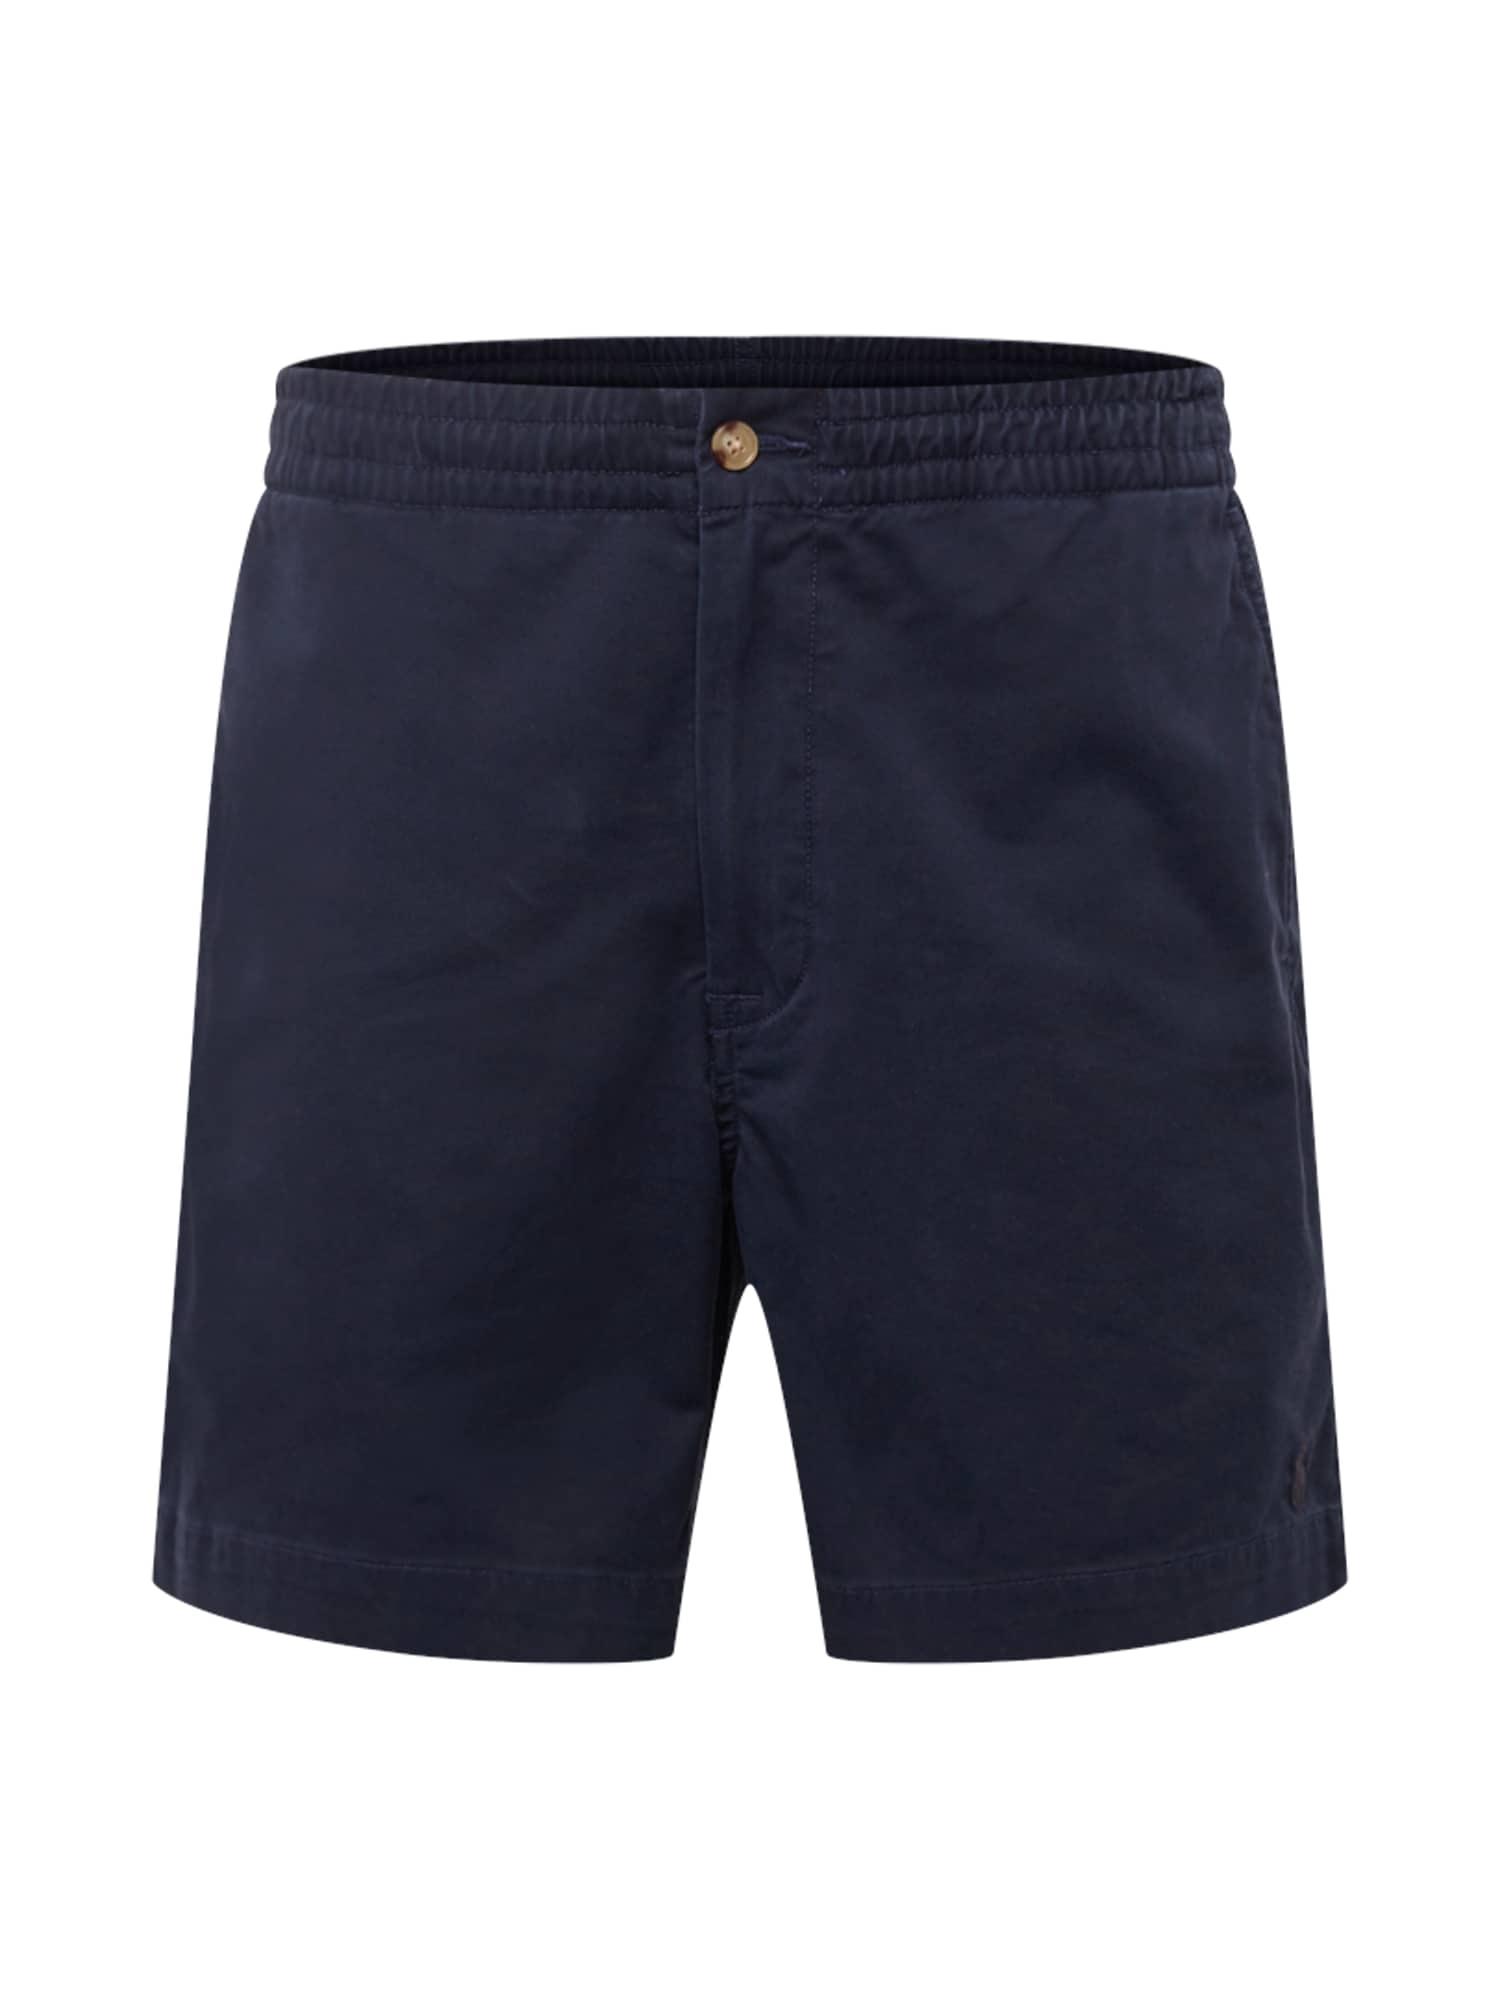 Chino kalhoty CFPREPSTERS-FLAT-SHORT marine modrá POLO RALPH LAUREN